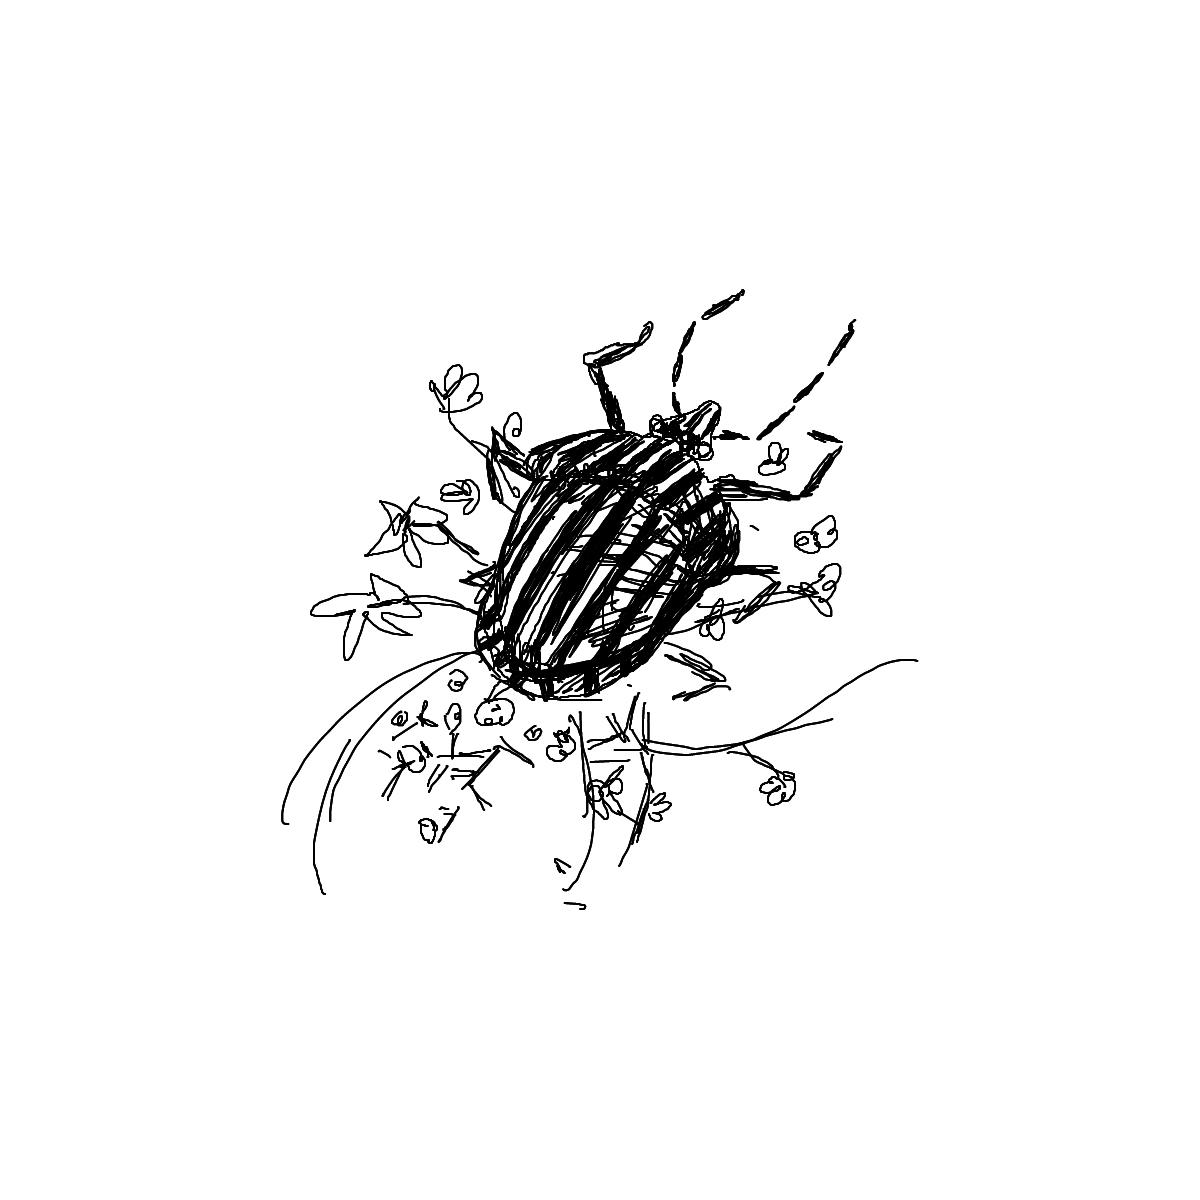 BAAAM drawing#8858 lat:51.8872070312500000lng: 10.5693702697753900